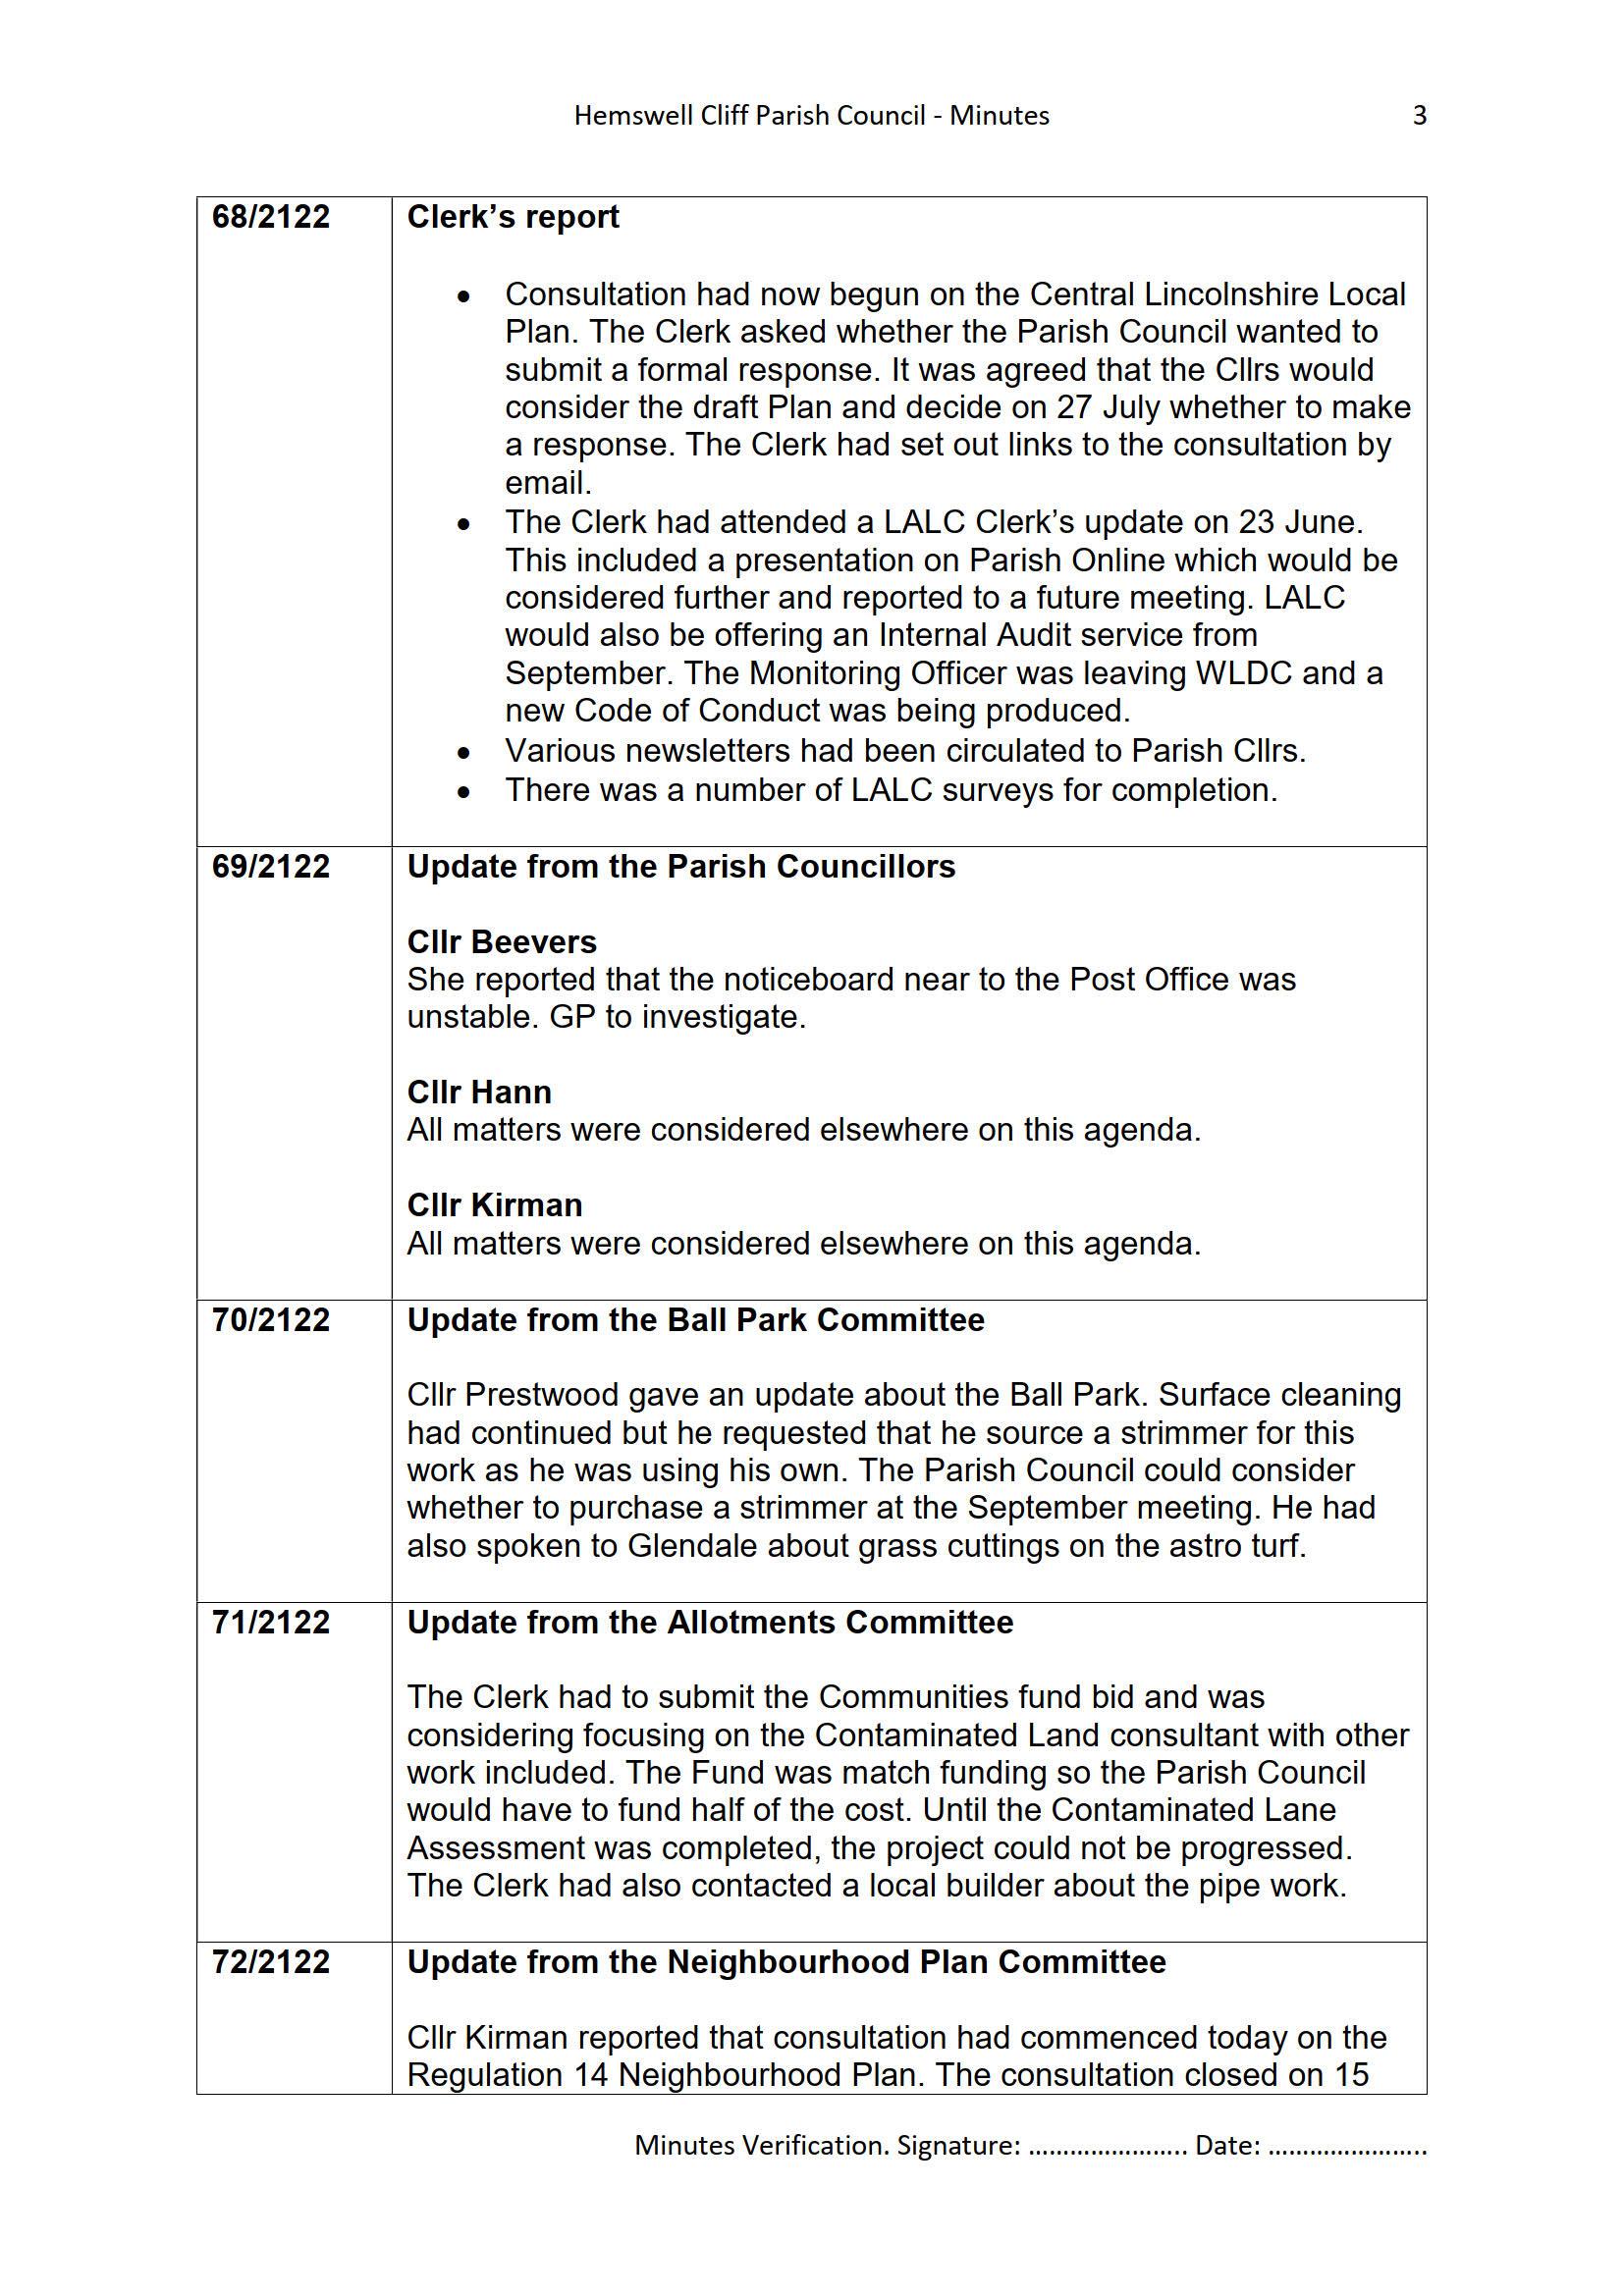 HCPC_Minutes_05.07.21_3.jpg